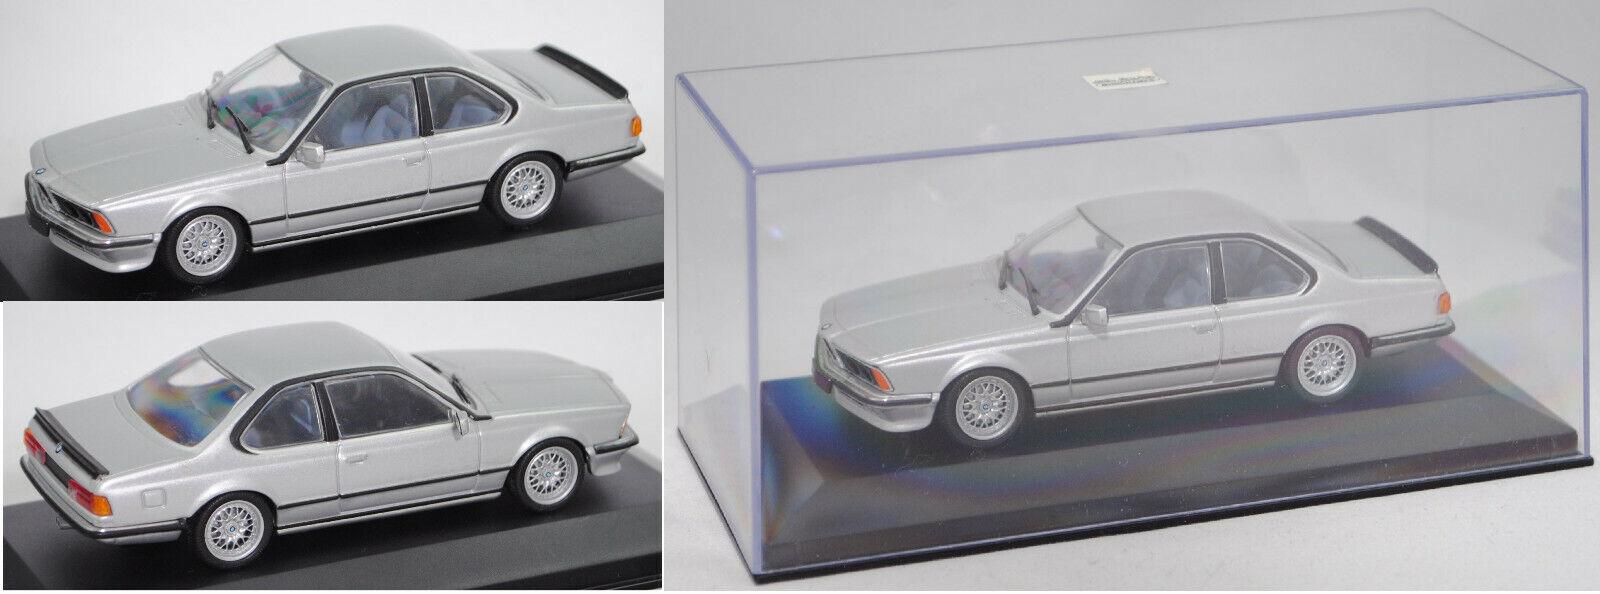 Minichamps 430025120 BMW 635 CSi, polaris metalliskt, 1 43